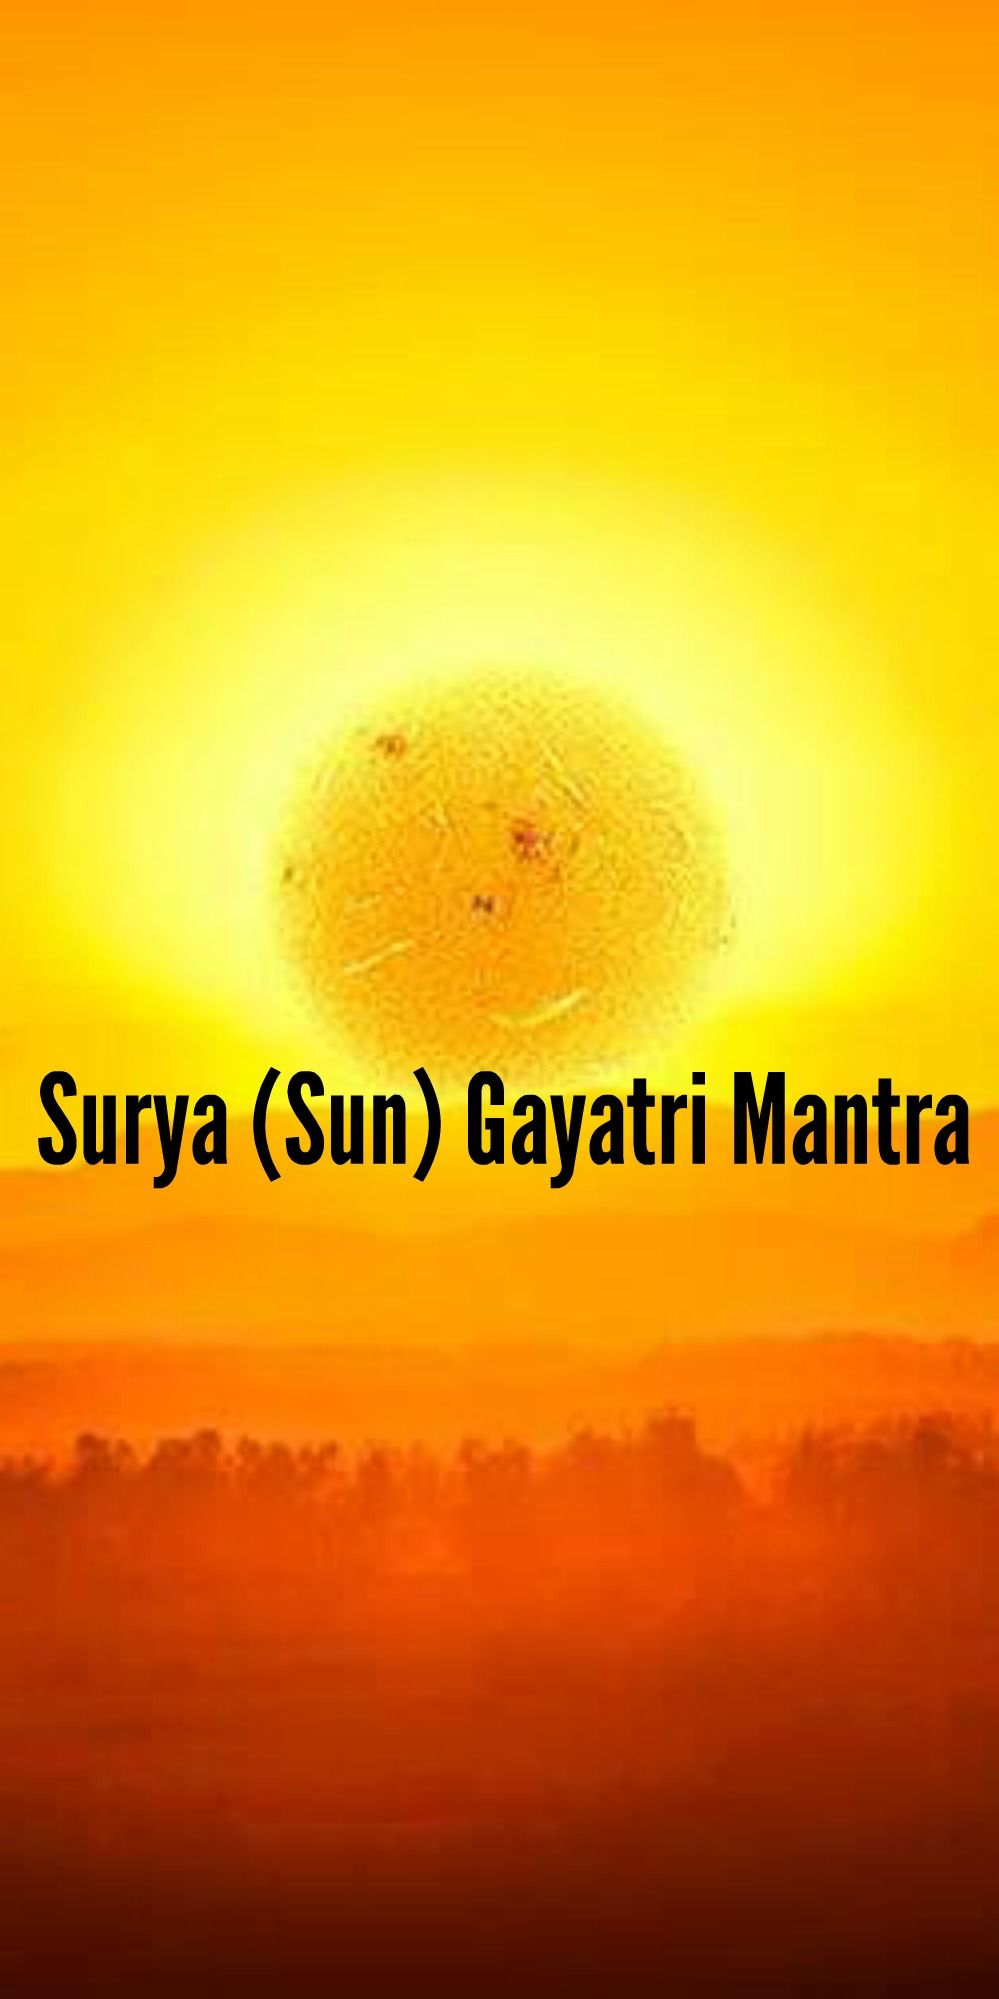 Surya (Sun) Gayatri Mantra – Lyrics, Meaning and Benefits